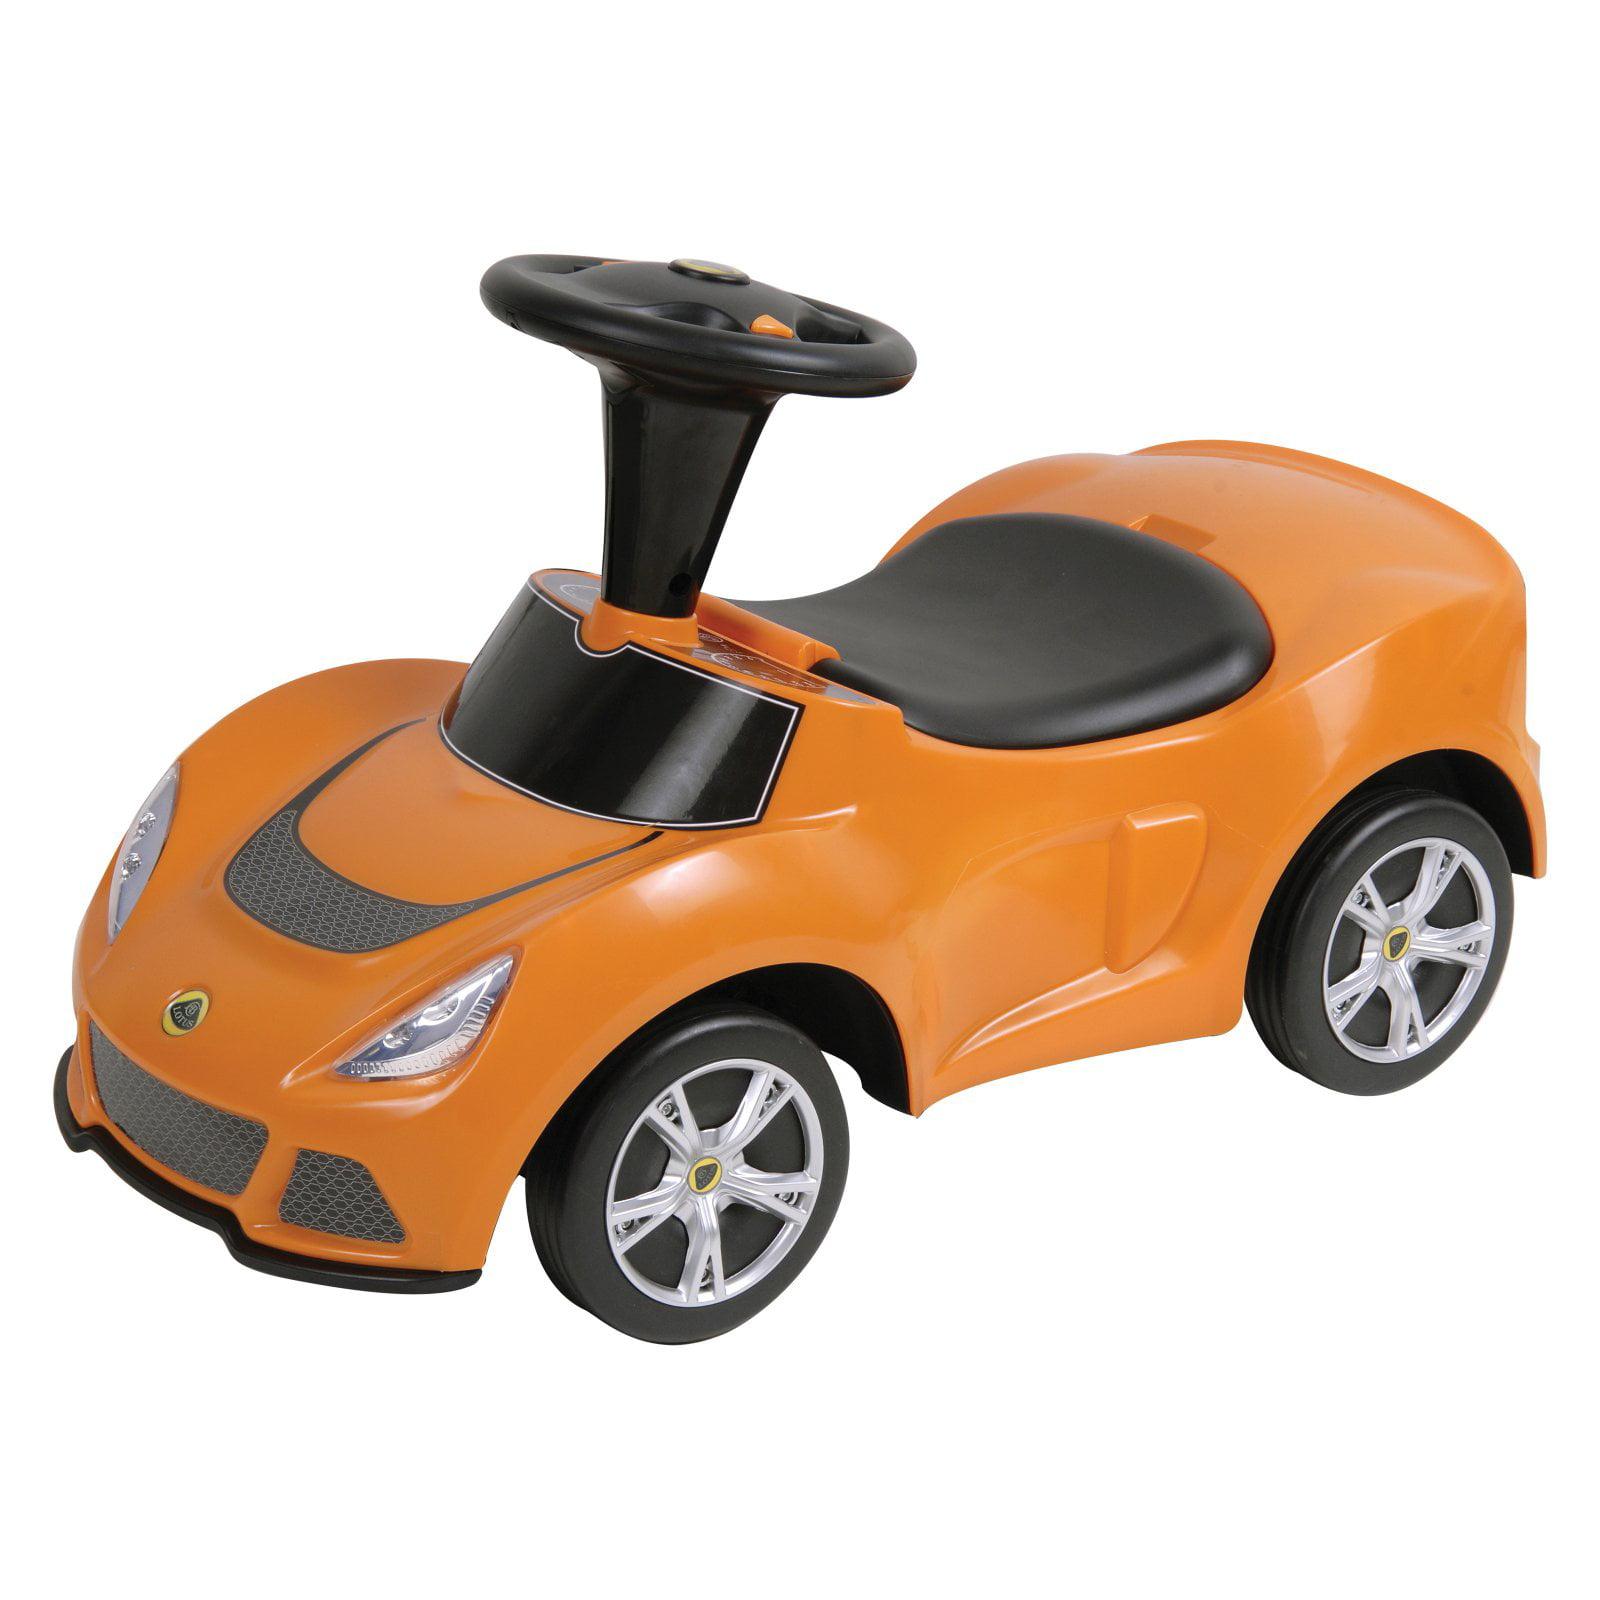 Lotus Exige S Foot-to-Floor Race Car by Dexton Kids